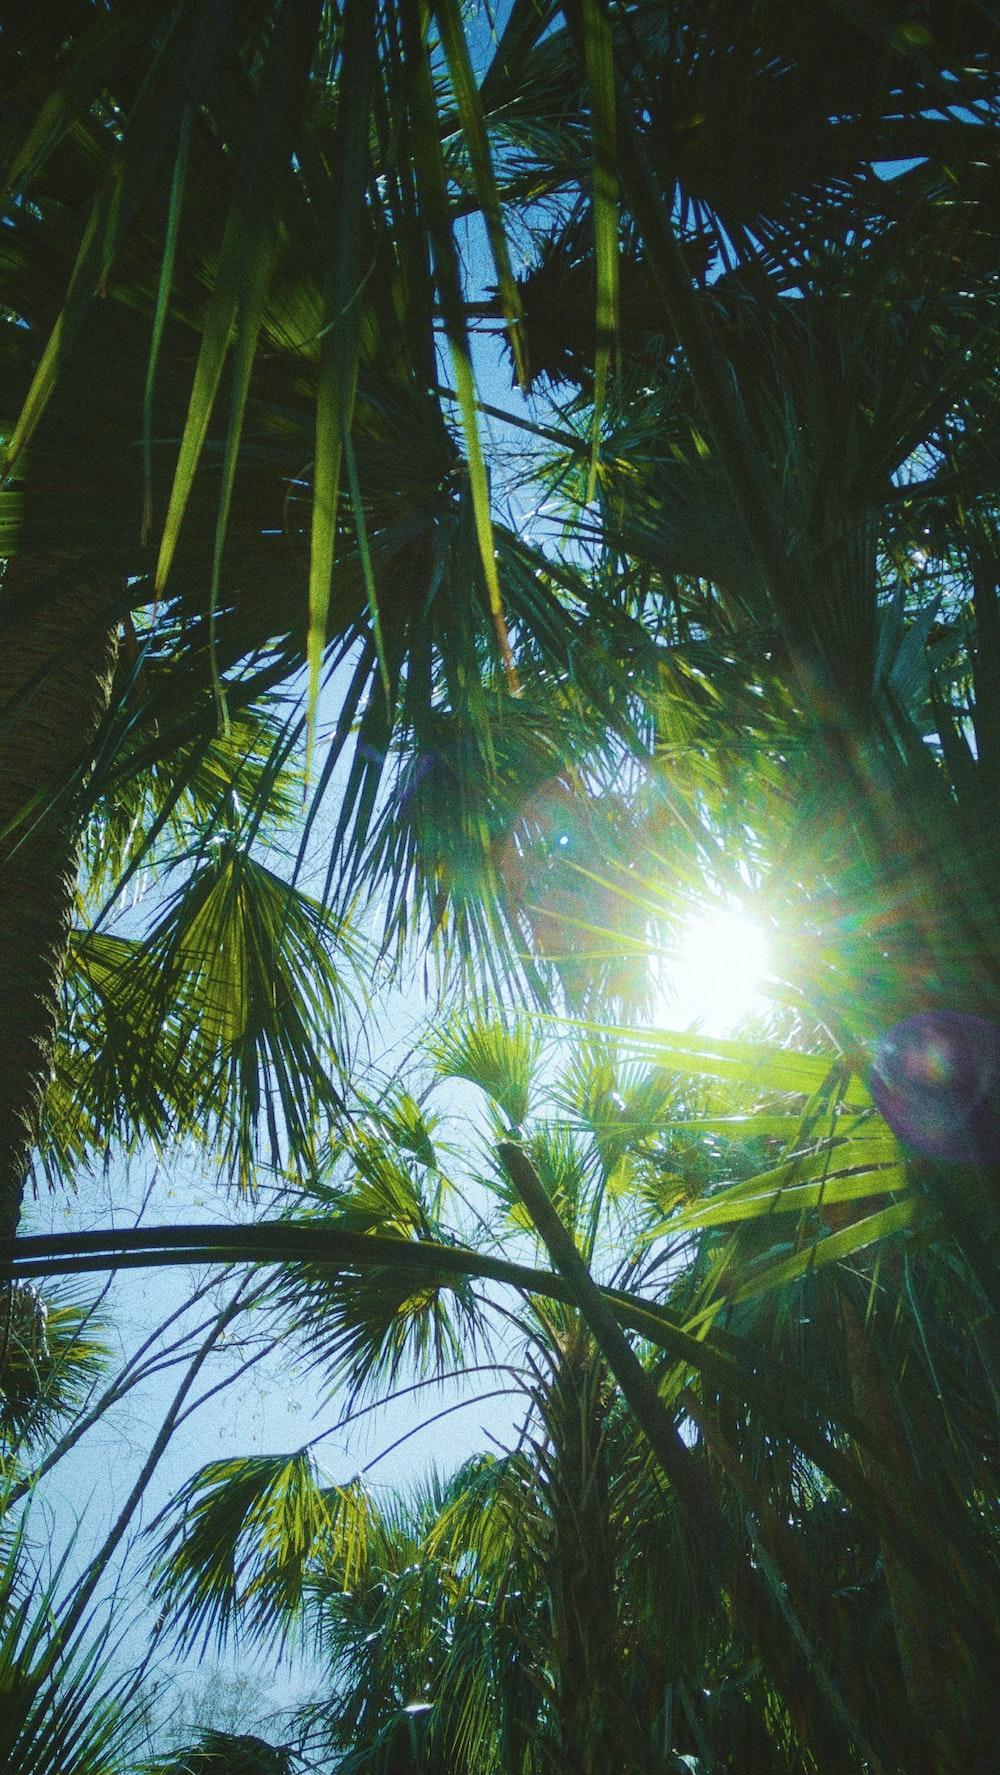 sun rays coming through green palm tree